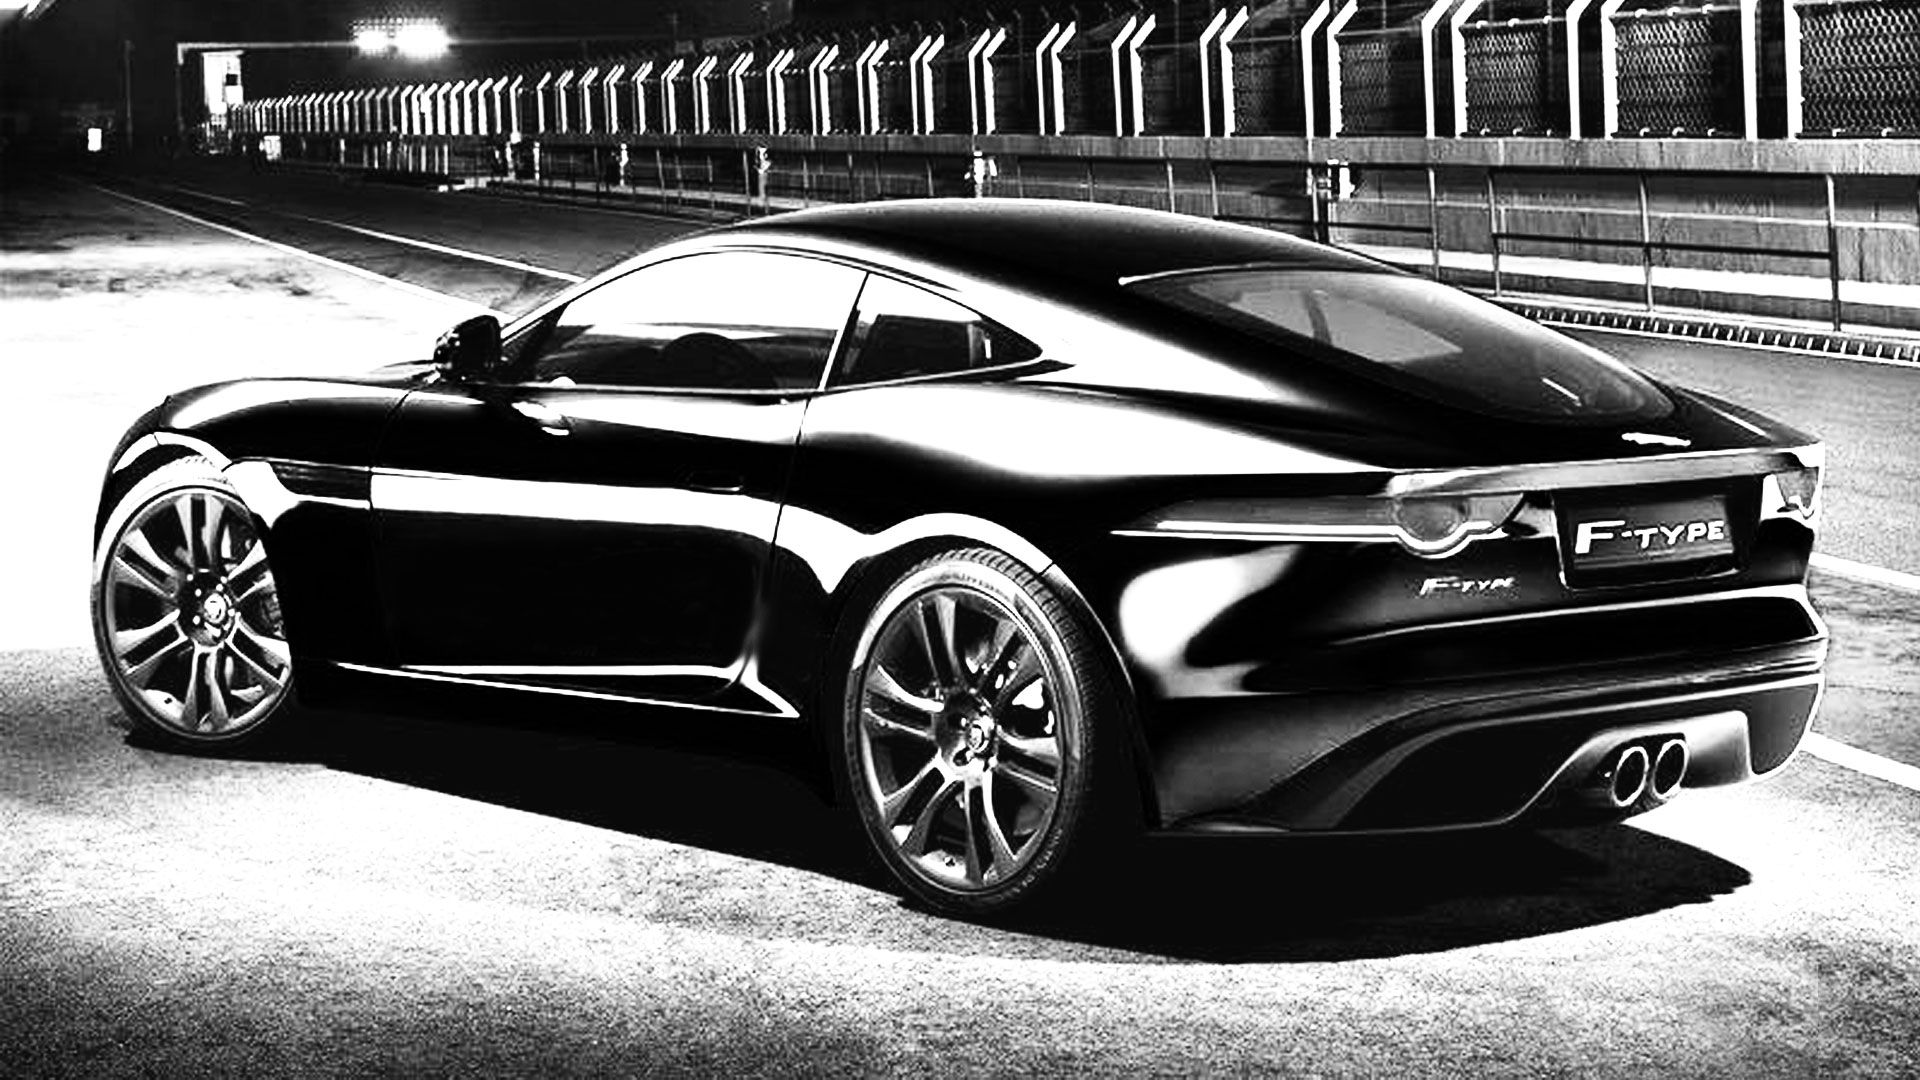 2014 jaguar ftype coupe jaguar f type jaguar jaguar